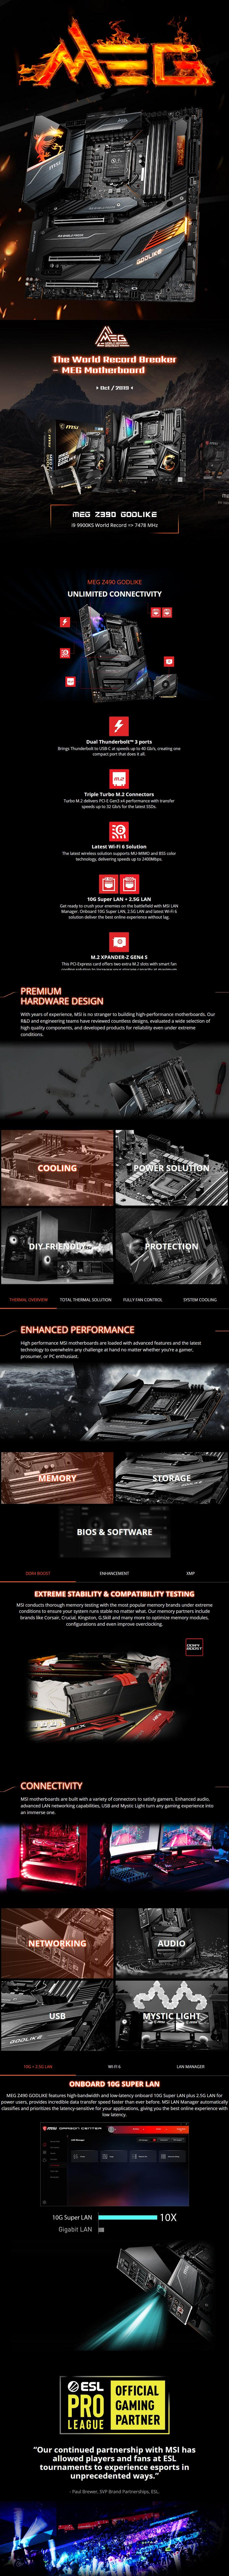 MSI MEG Z490 GODLIKE LGA 1200 E-ATX Motherboard - Overview 1